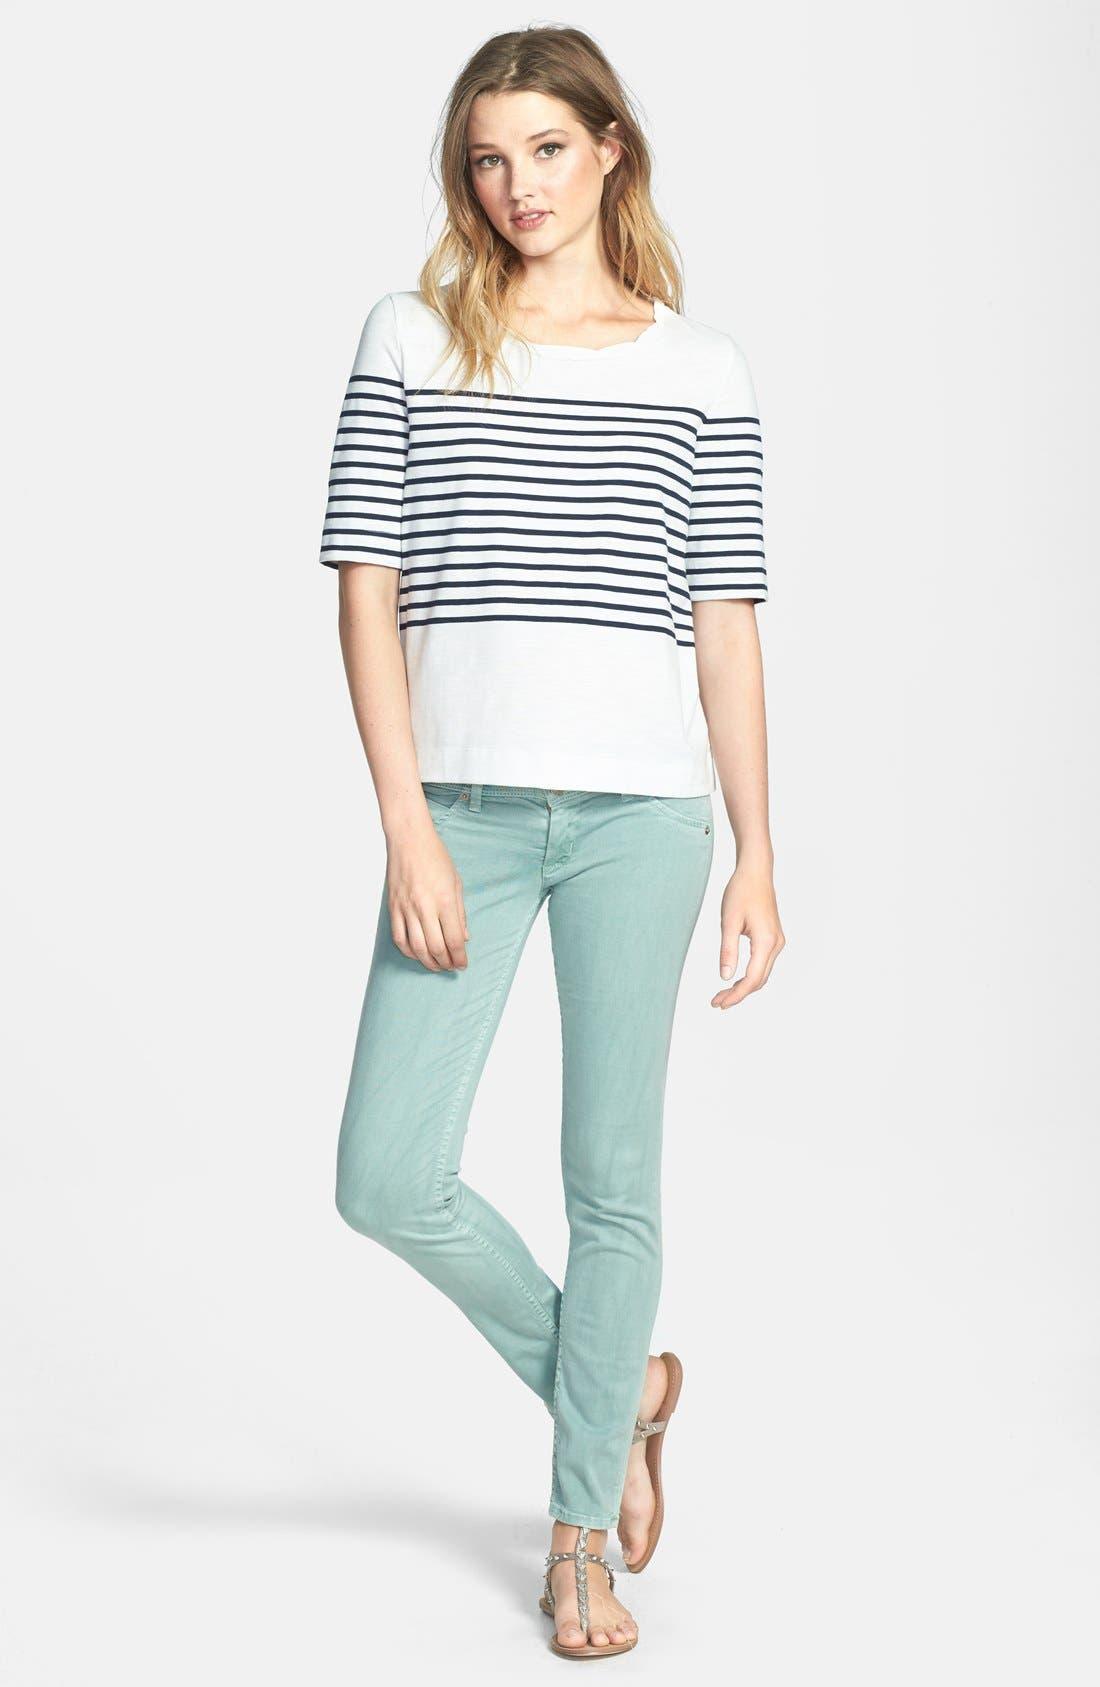 HUDSON JEANS Skinny Stretch Jeans, Main, color, 332